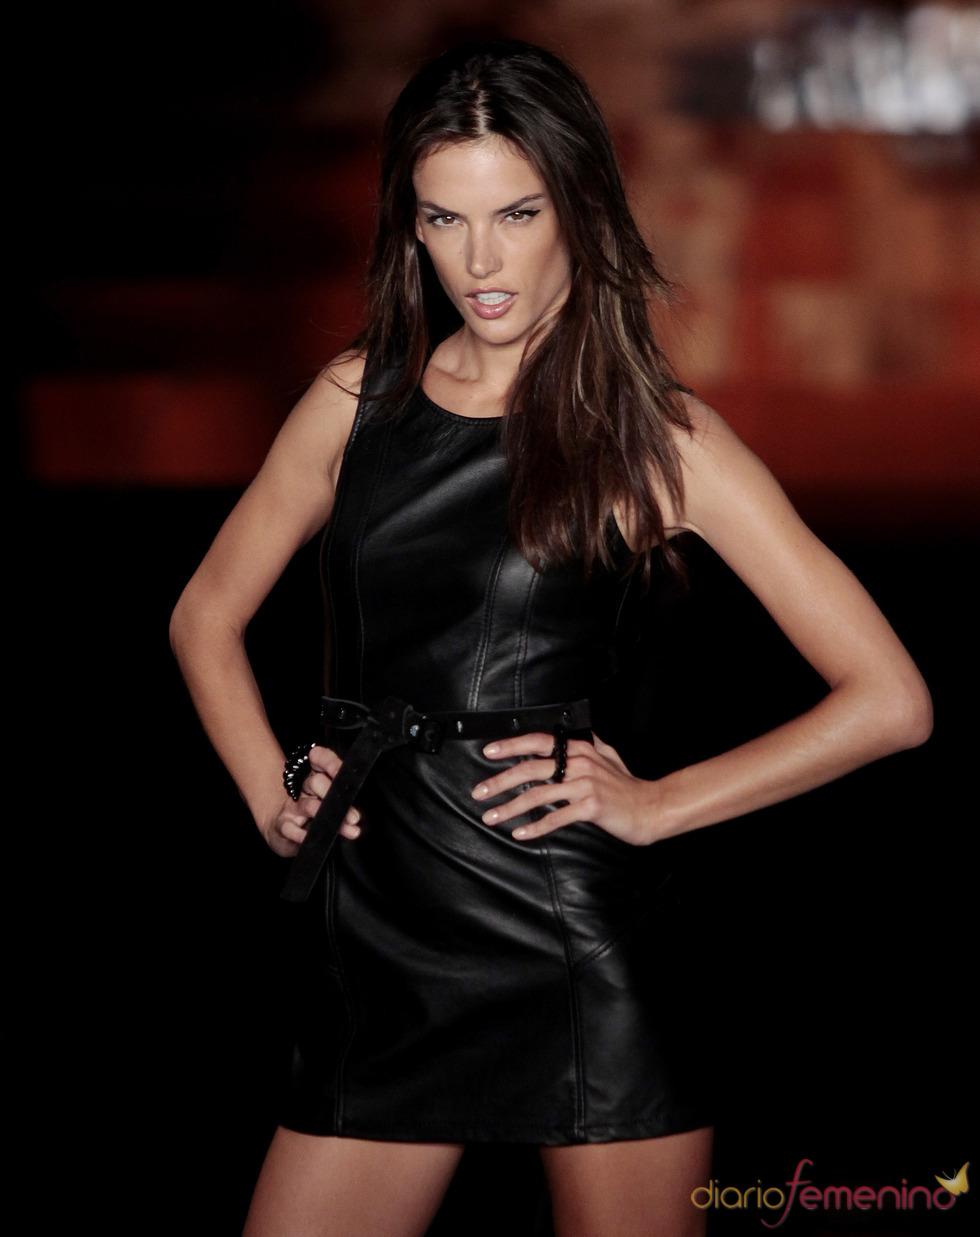 Alessandra Ambrosio en la Semana de la Moda de Sao Paulo